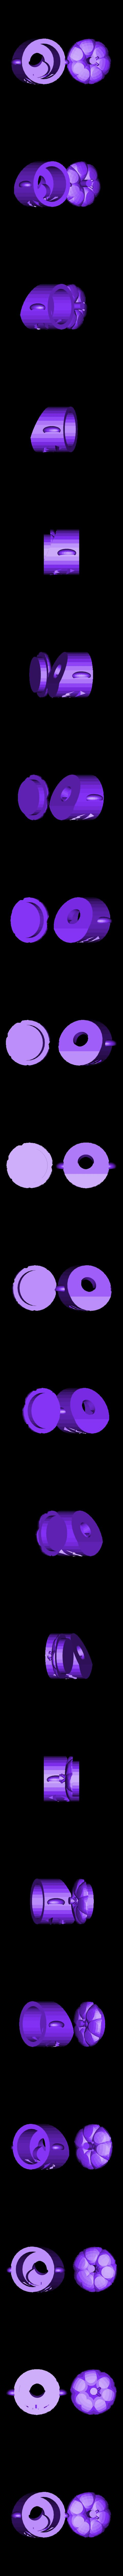 head_mrjack_big.stl Download free STL file MR:JACK • 3D printable object, NoNe